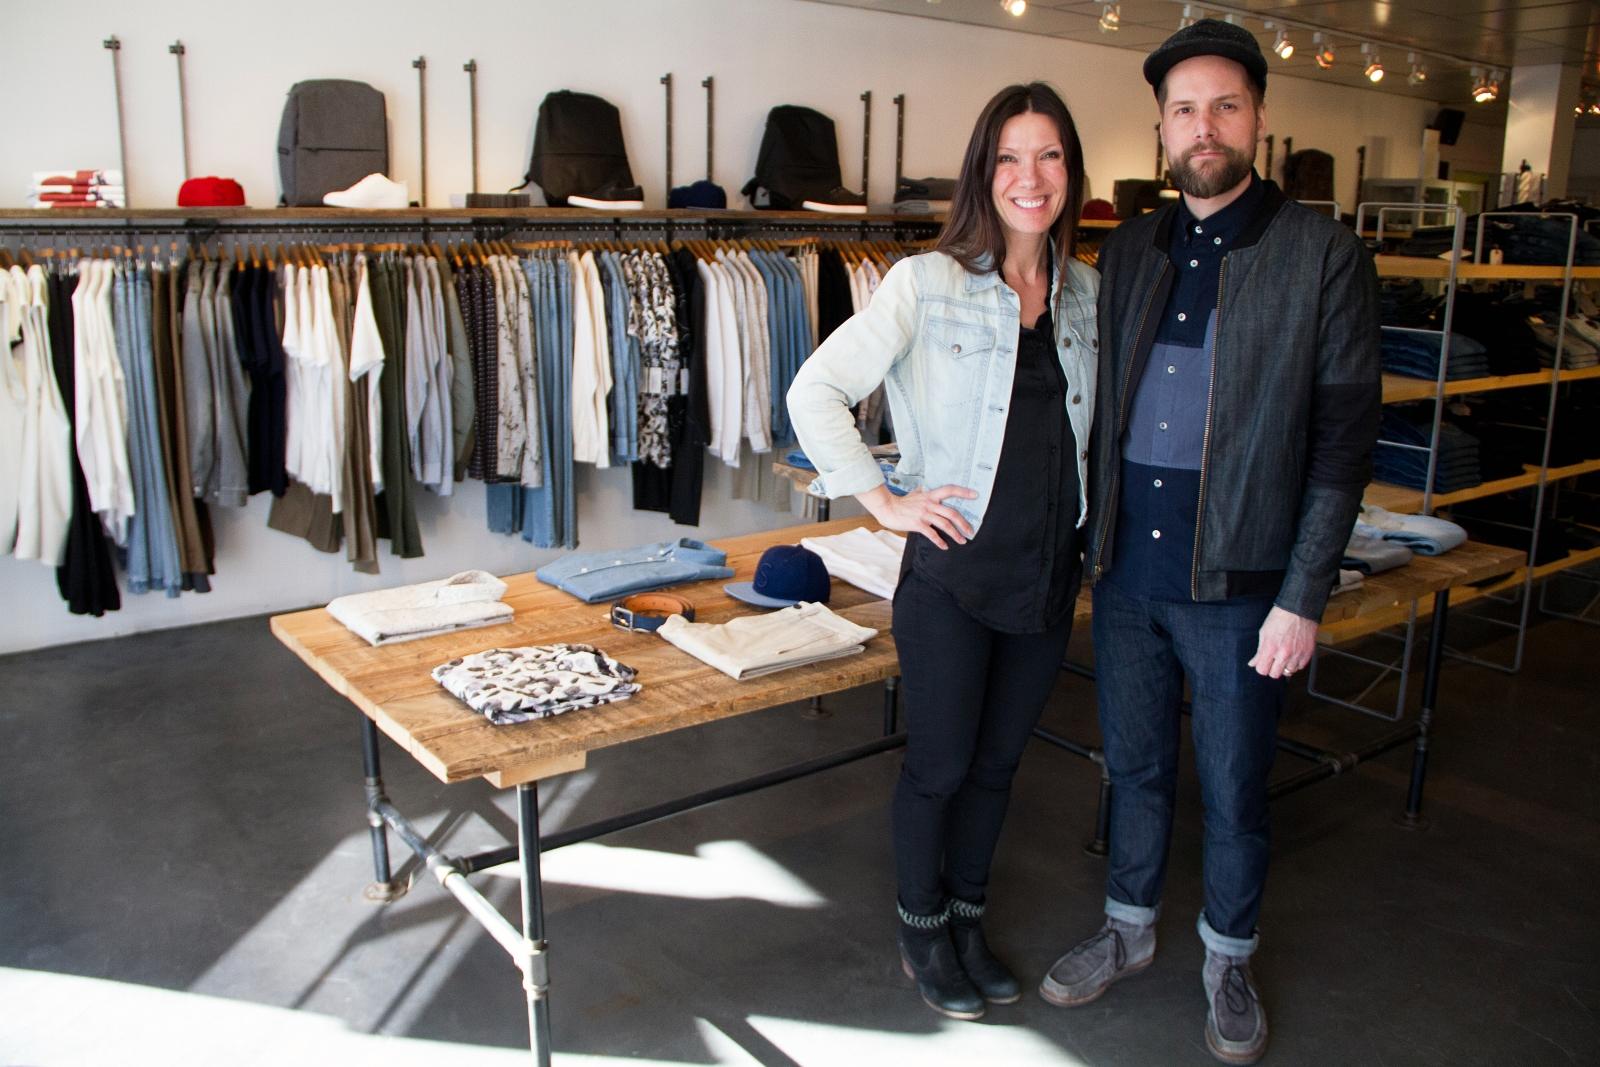 Leo Boutique co-founders, Cornelia and Jon Wiebe.